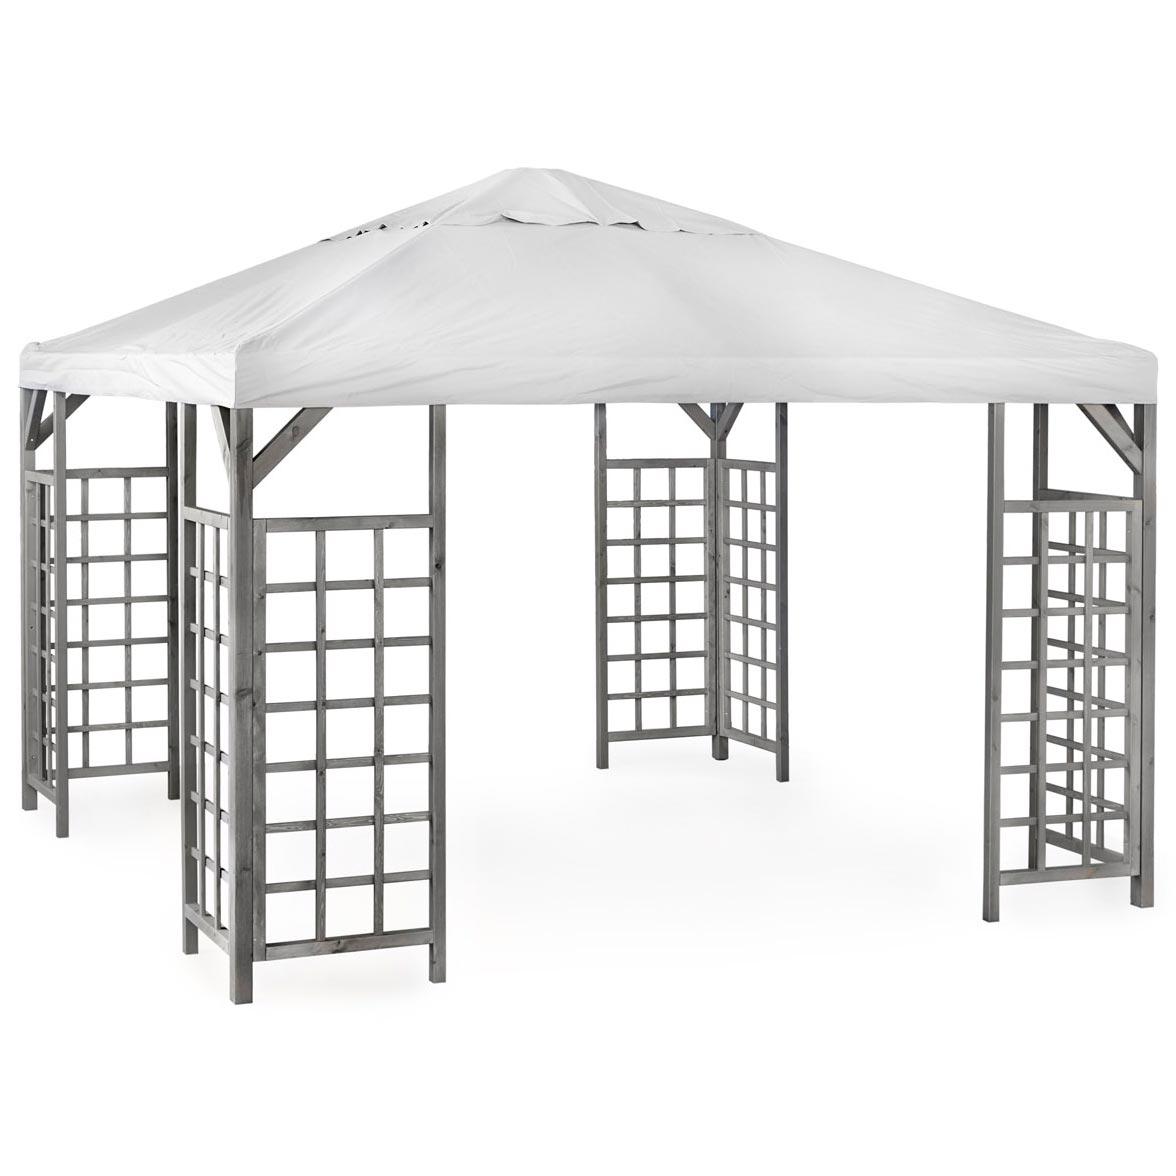 Hov paviljong 3x4 m i grå furu från Brafab.